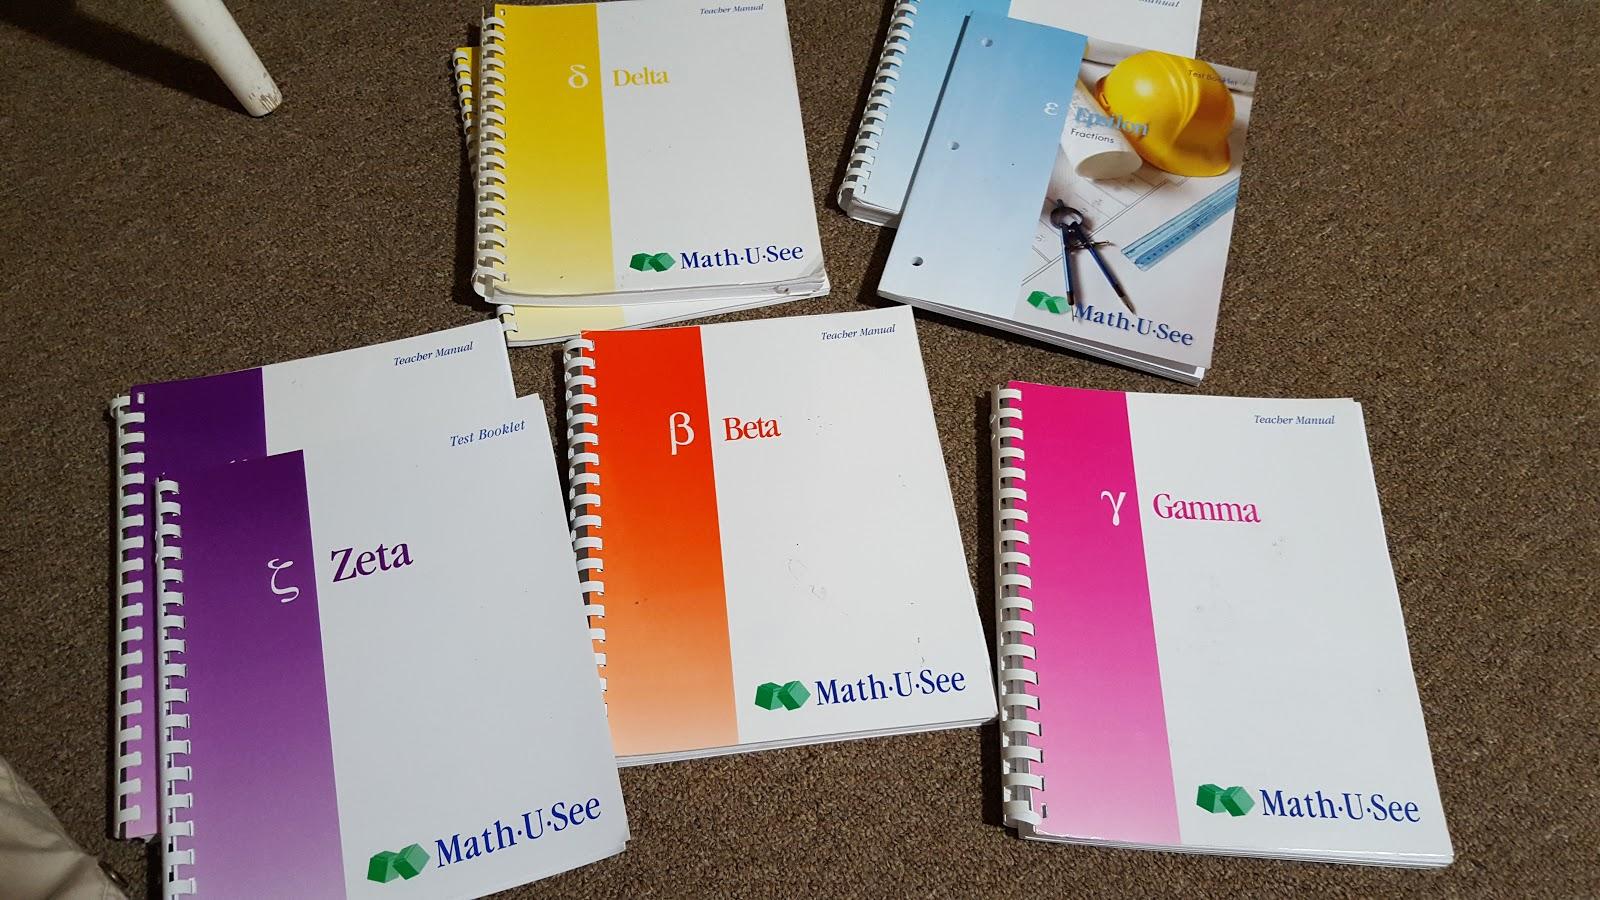 Math U See Epsilon 2009 Set: Instruction Manual, Test Booklet, Fractions DVD